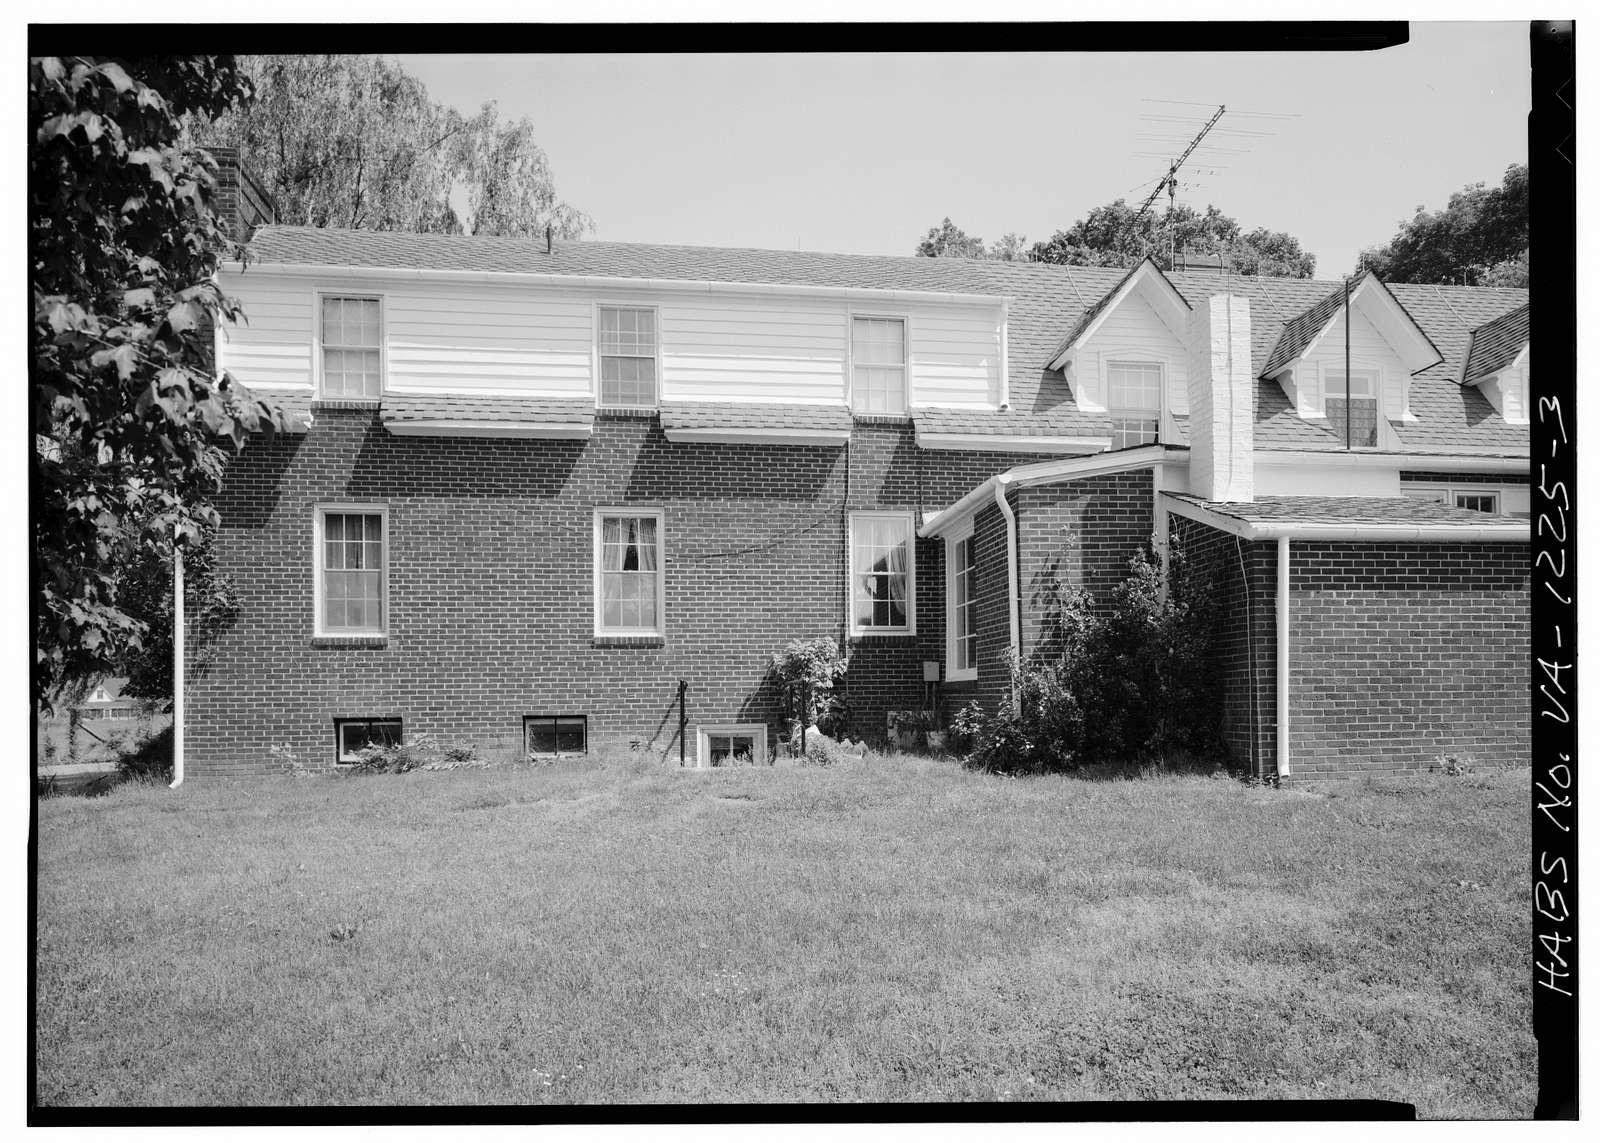 Ferncliff Farm, Route 613 & South Anna Bridge vicinity, Trevilians, Louisa County, VA